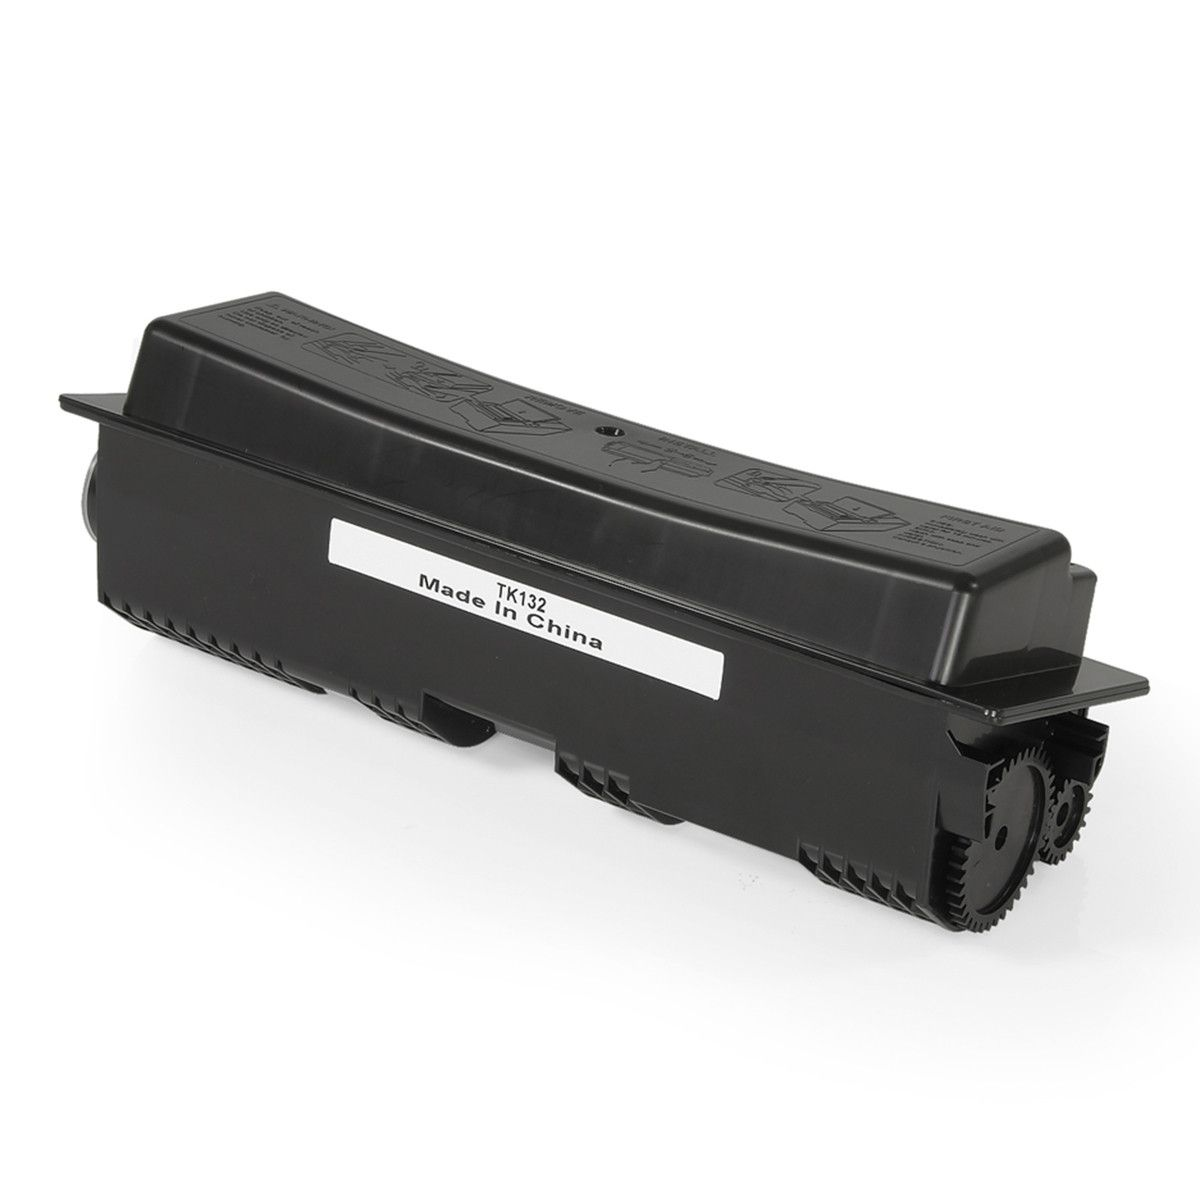 Toner compatível com KYOCERA TK172 TK170 FS1320D FS1370DN 7.200 Páginas -  Cartucho & Cia